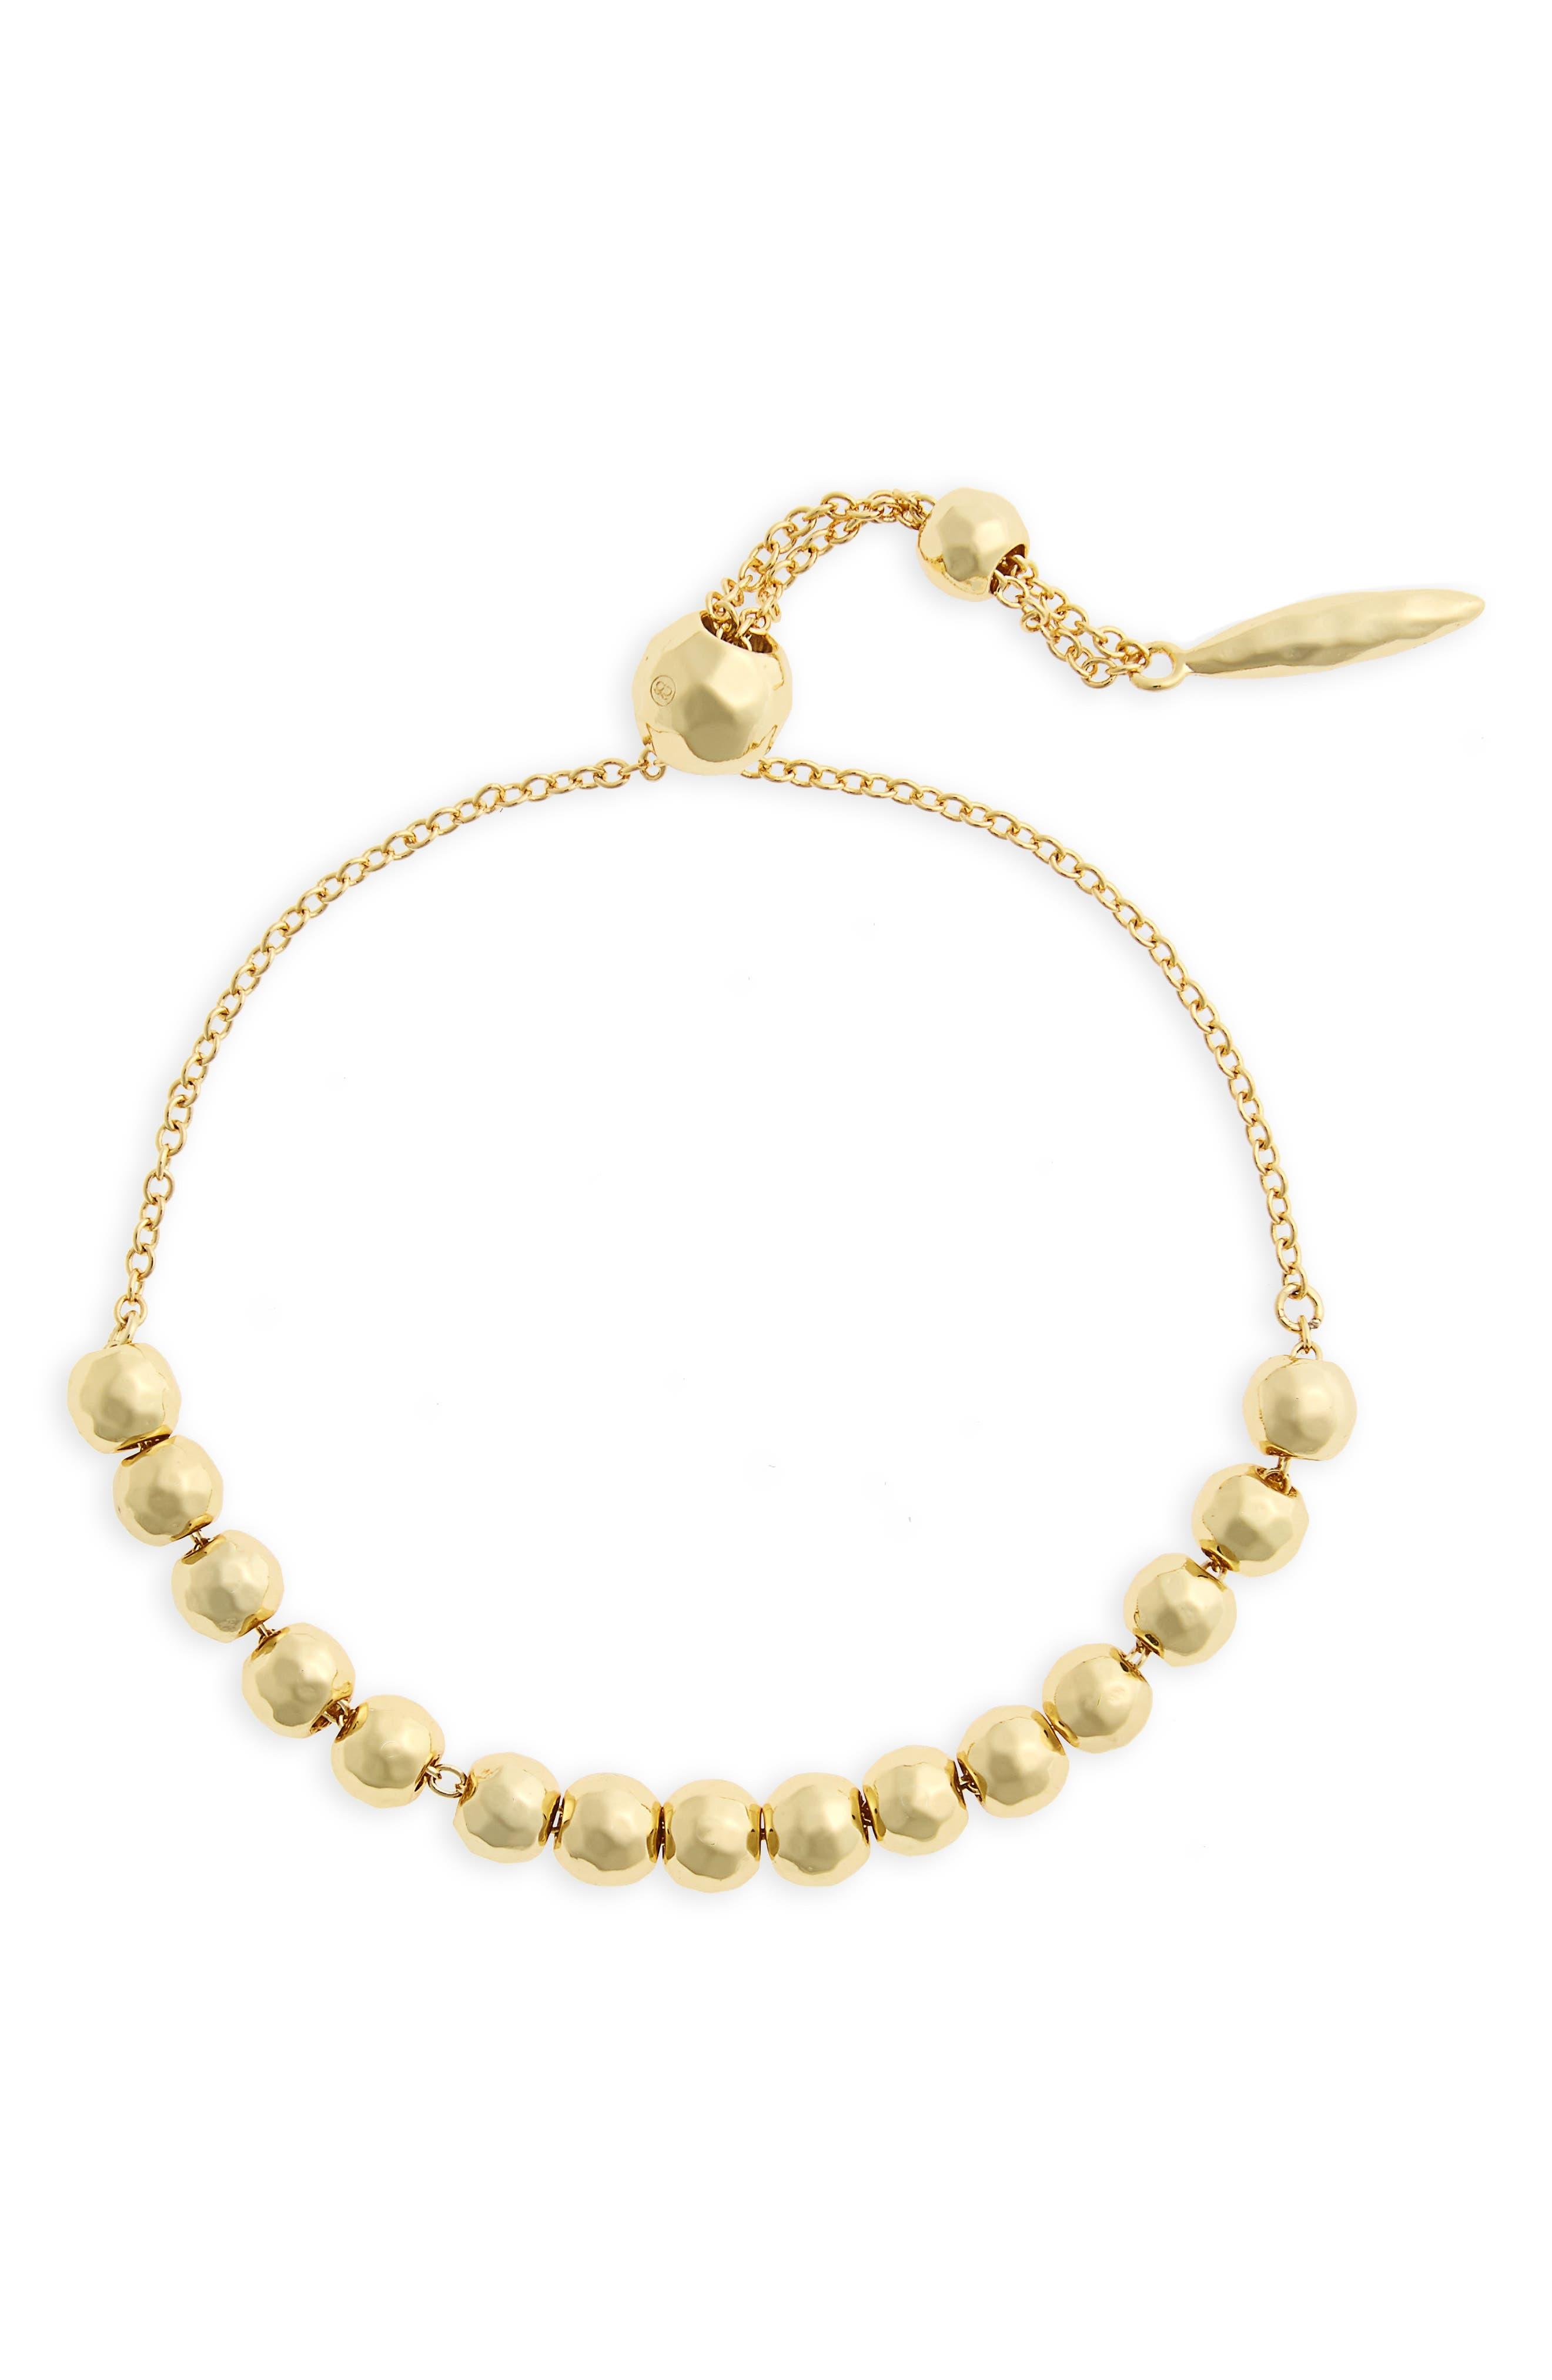 Main Image - gorjana Laguna Adjustable Bracelet